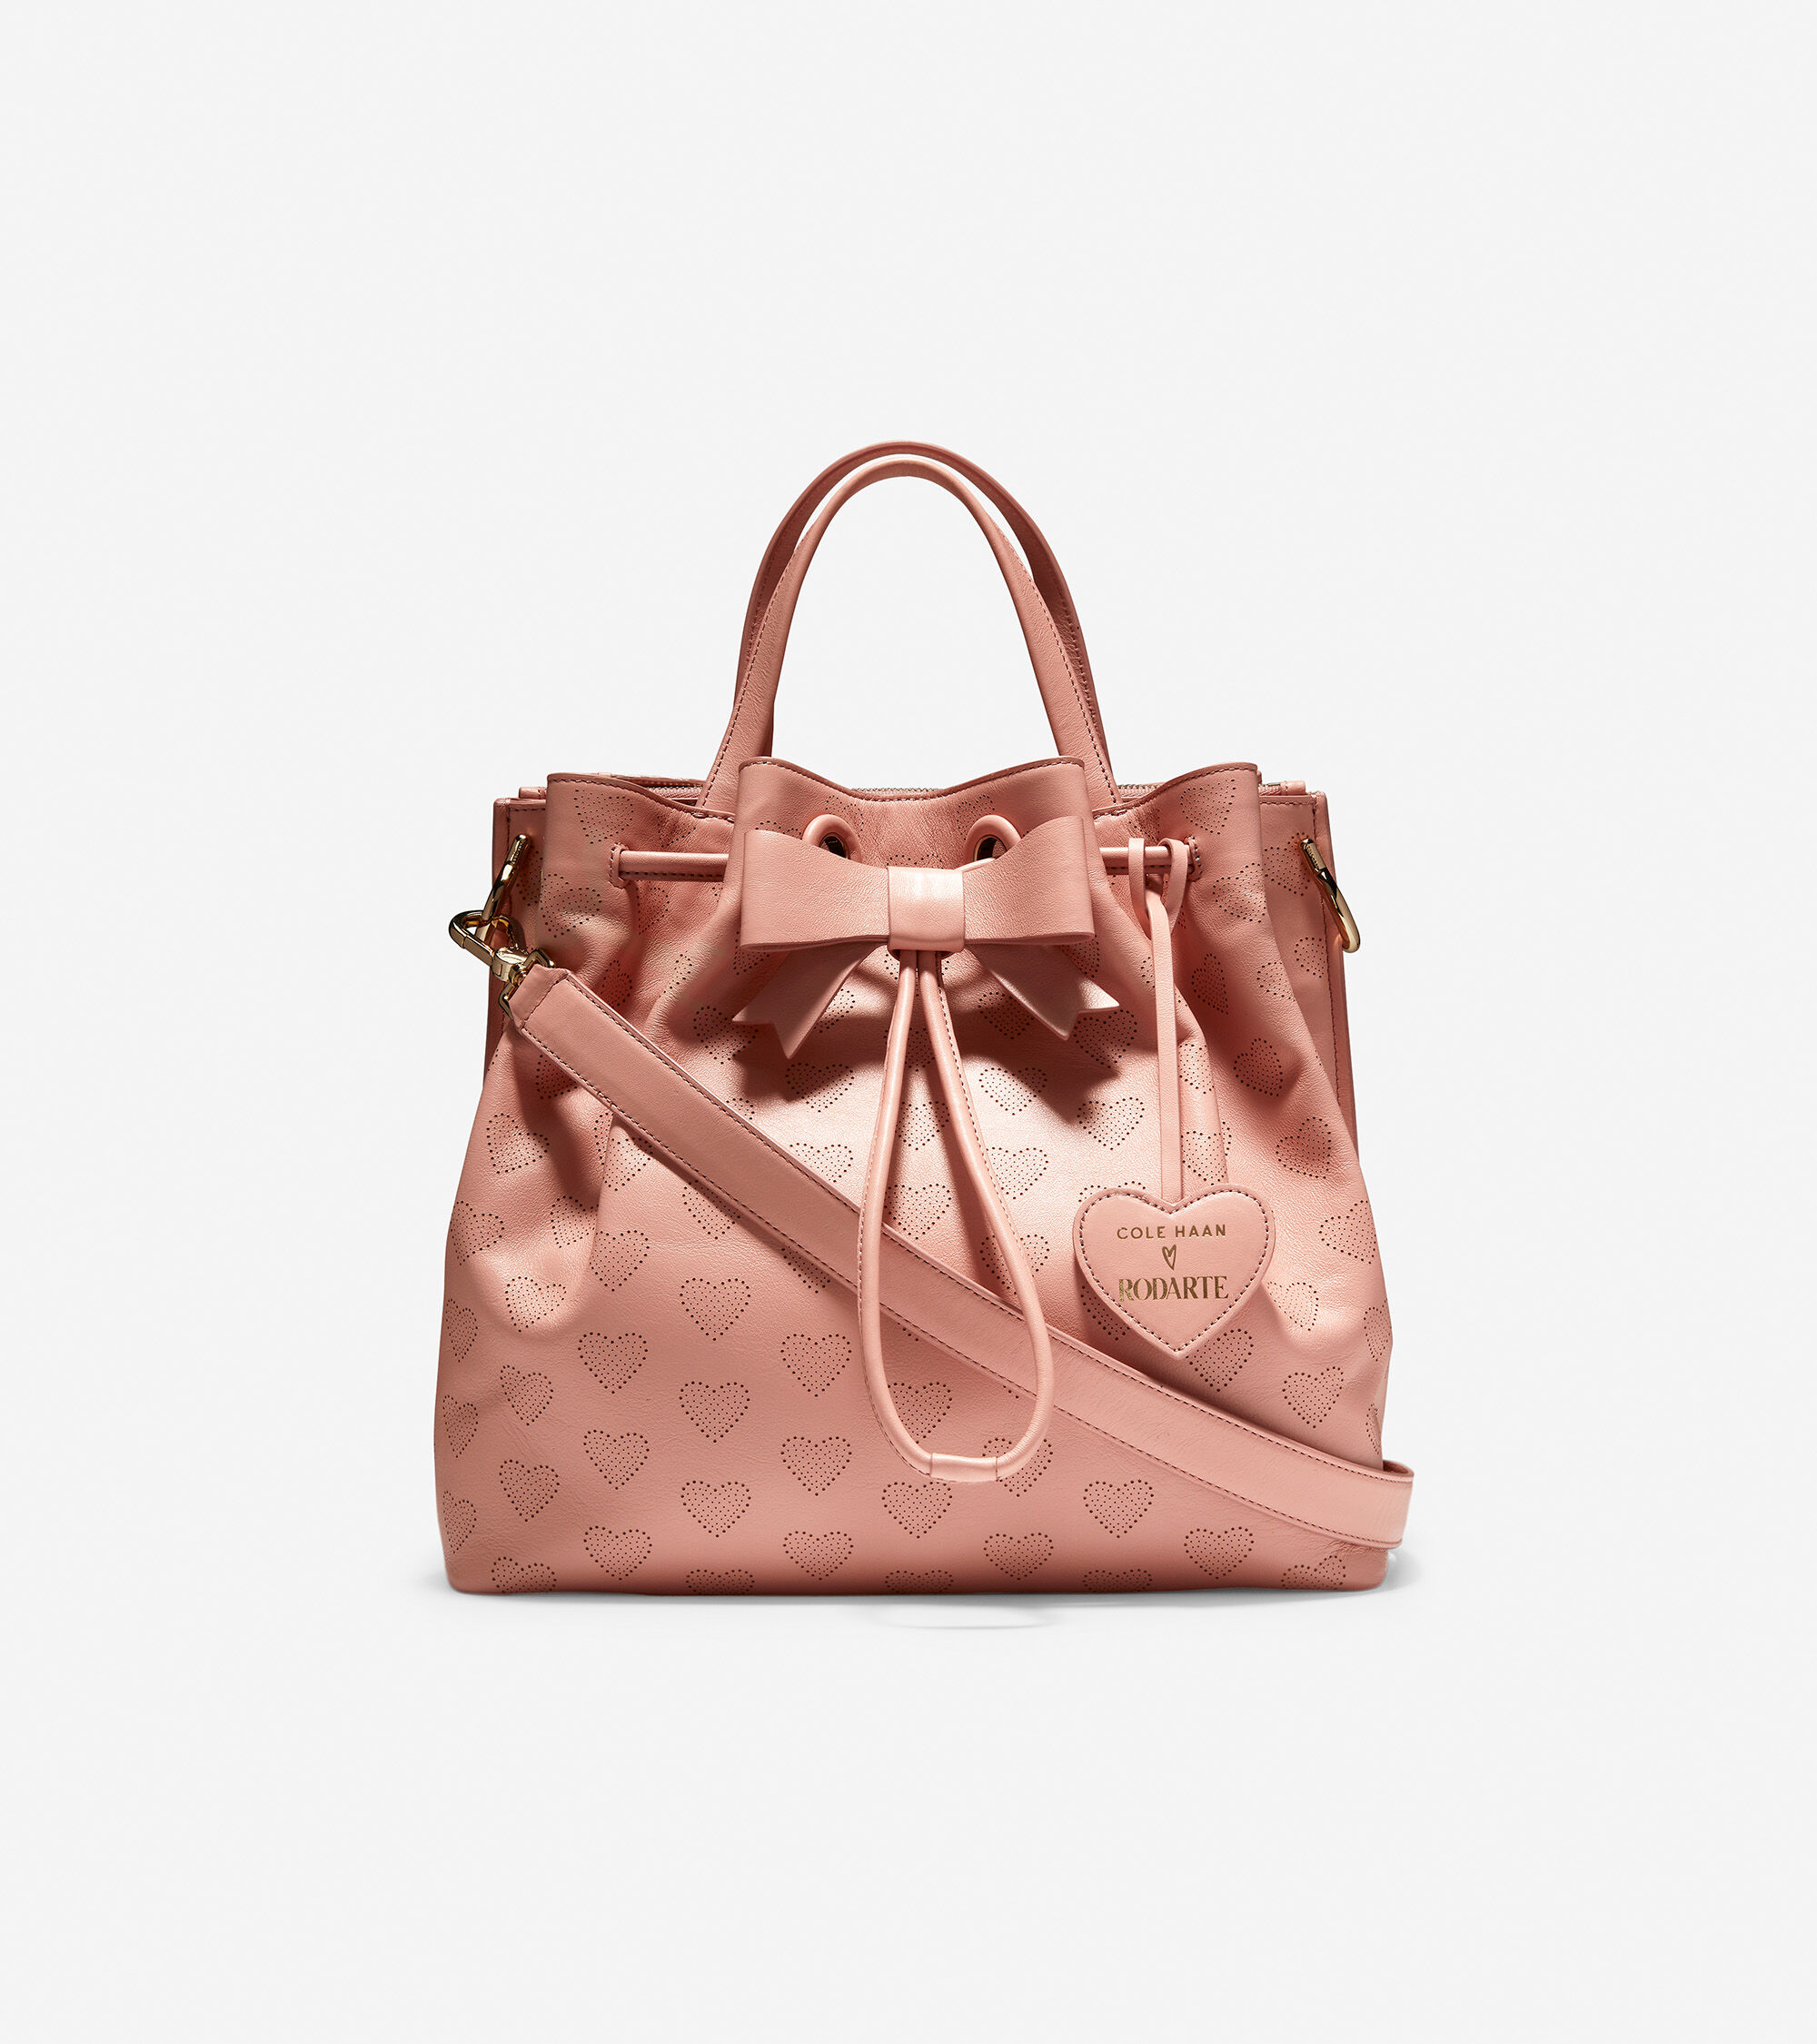 Cole Haan Outlet HandbagsHandbag